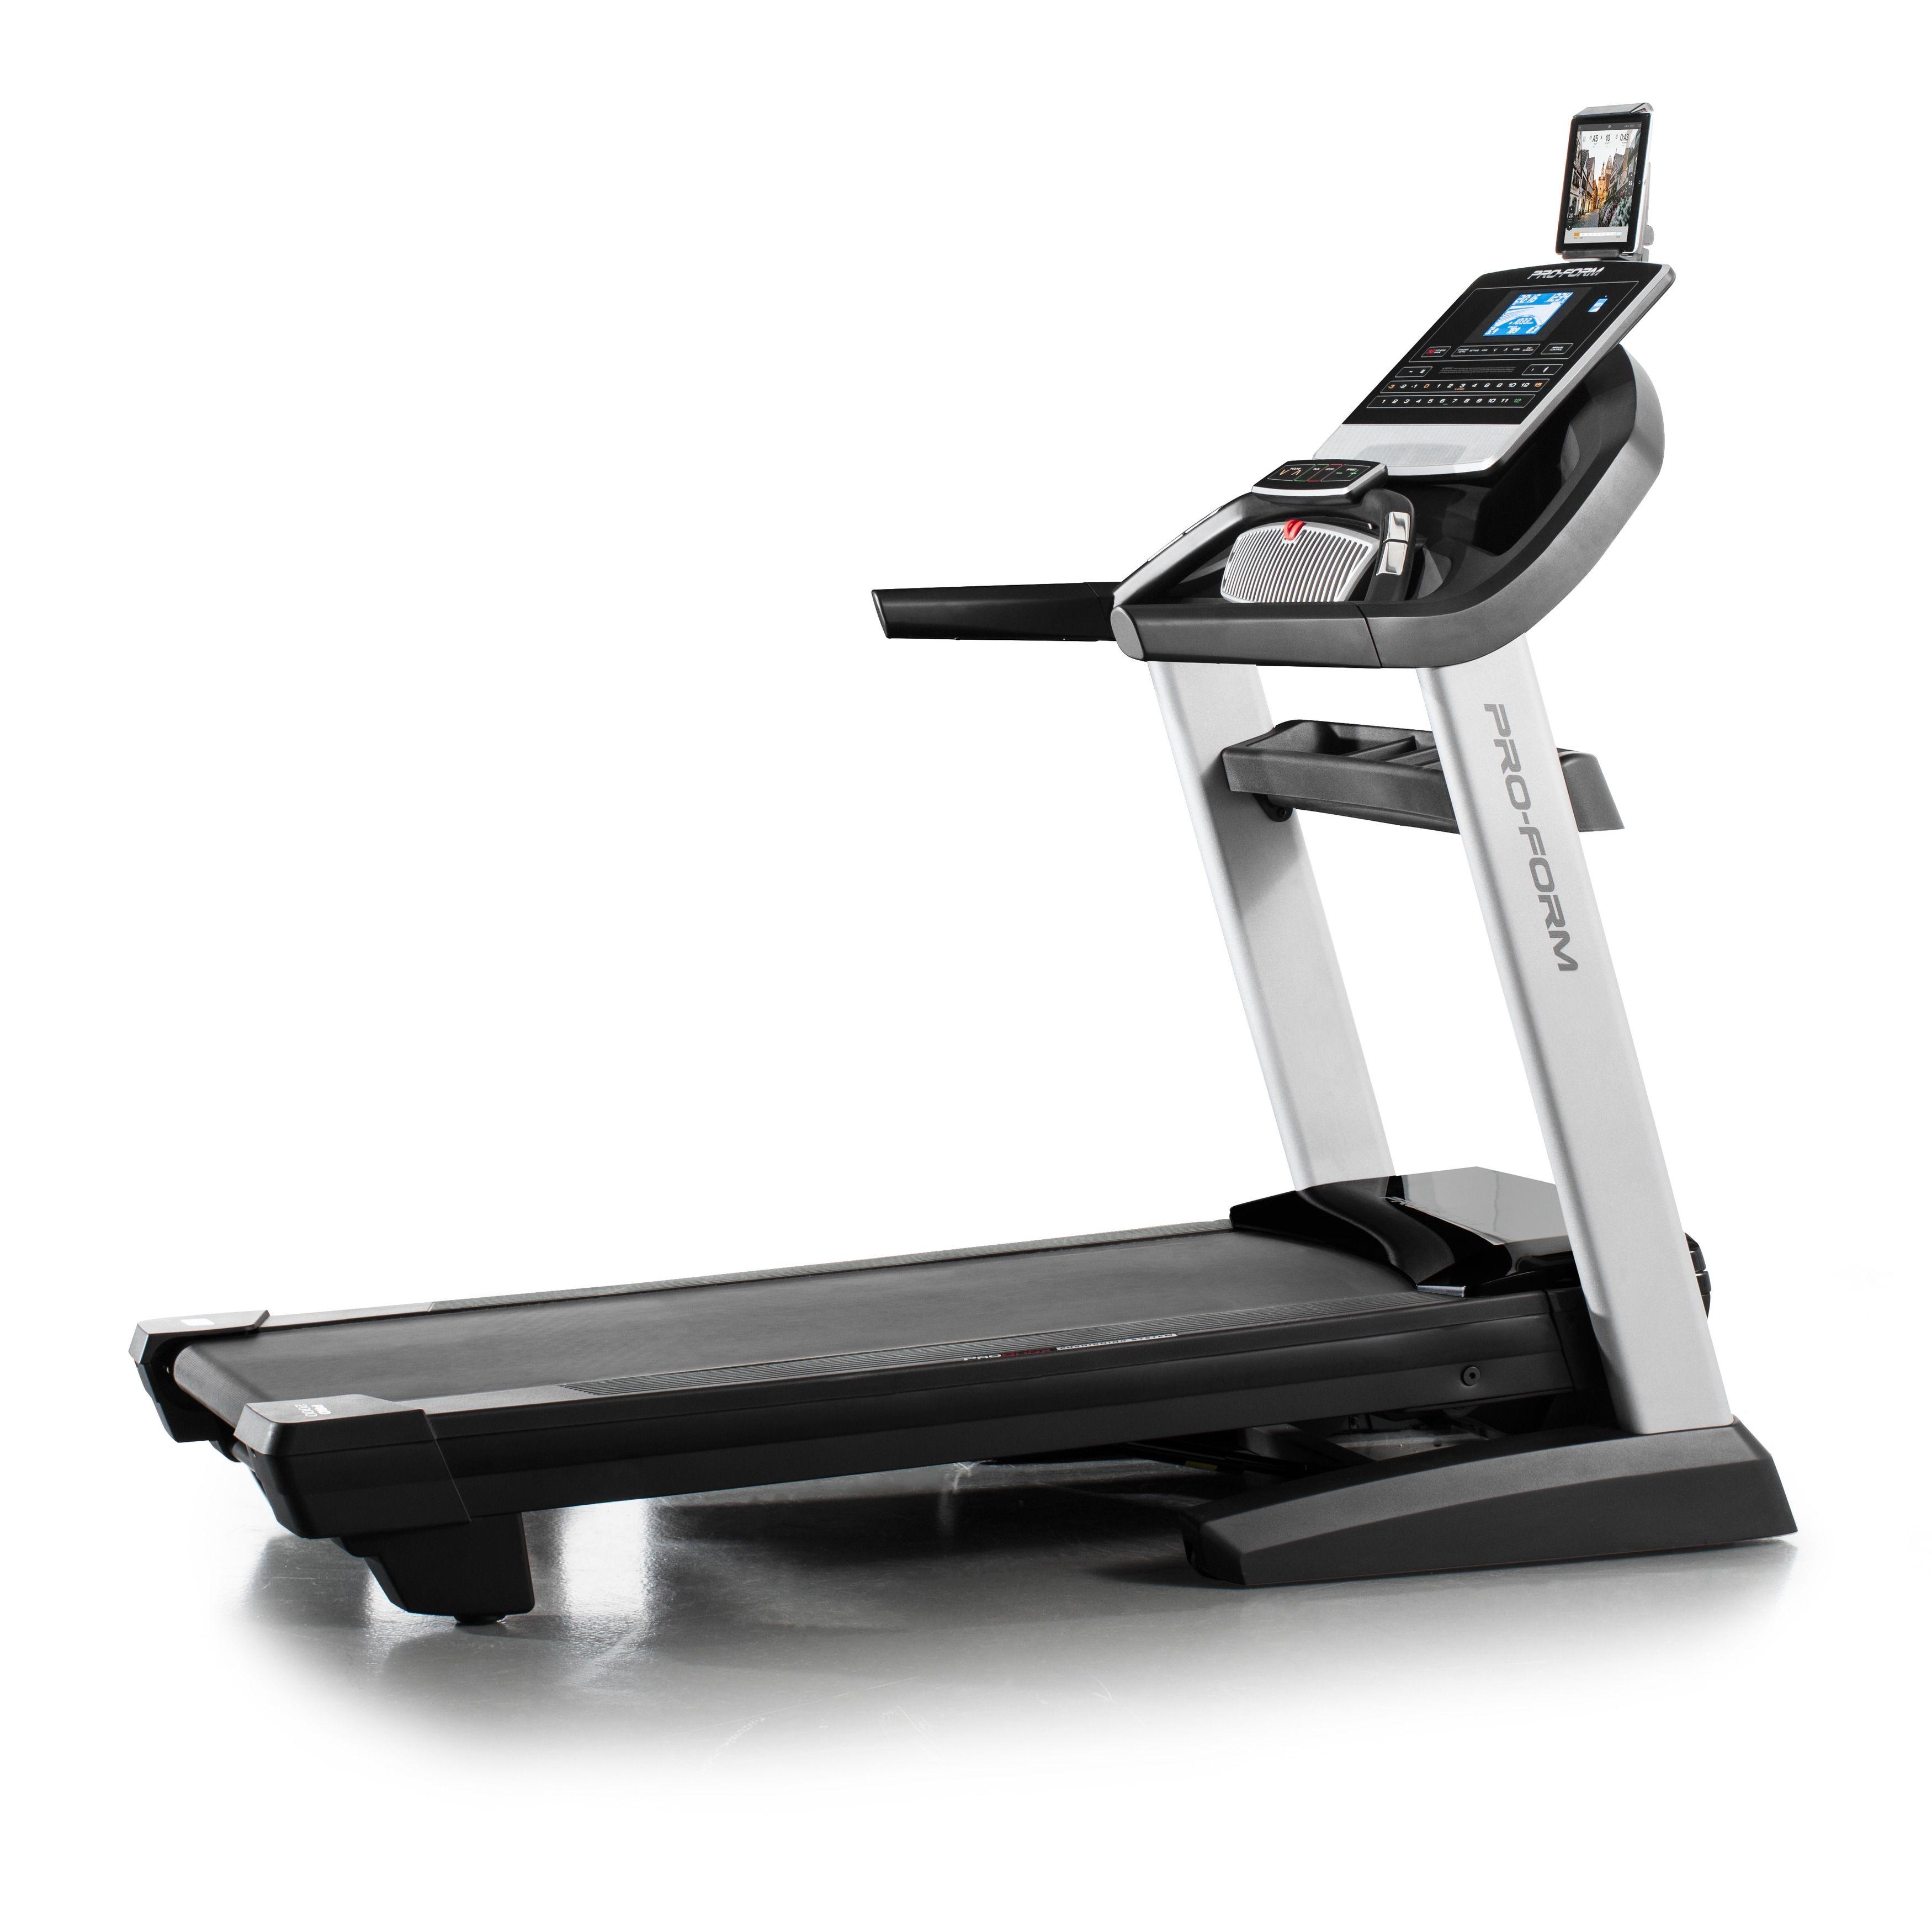 foto The Best Black Friday Deals On Treadmills